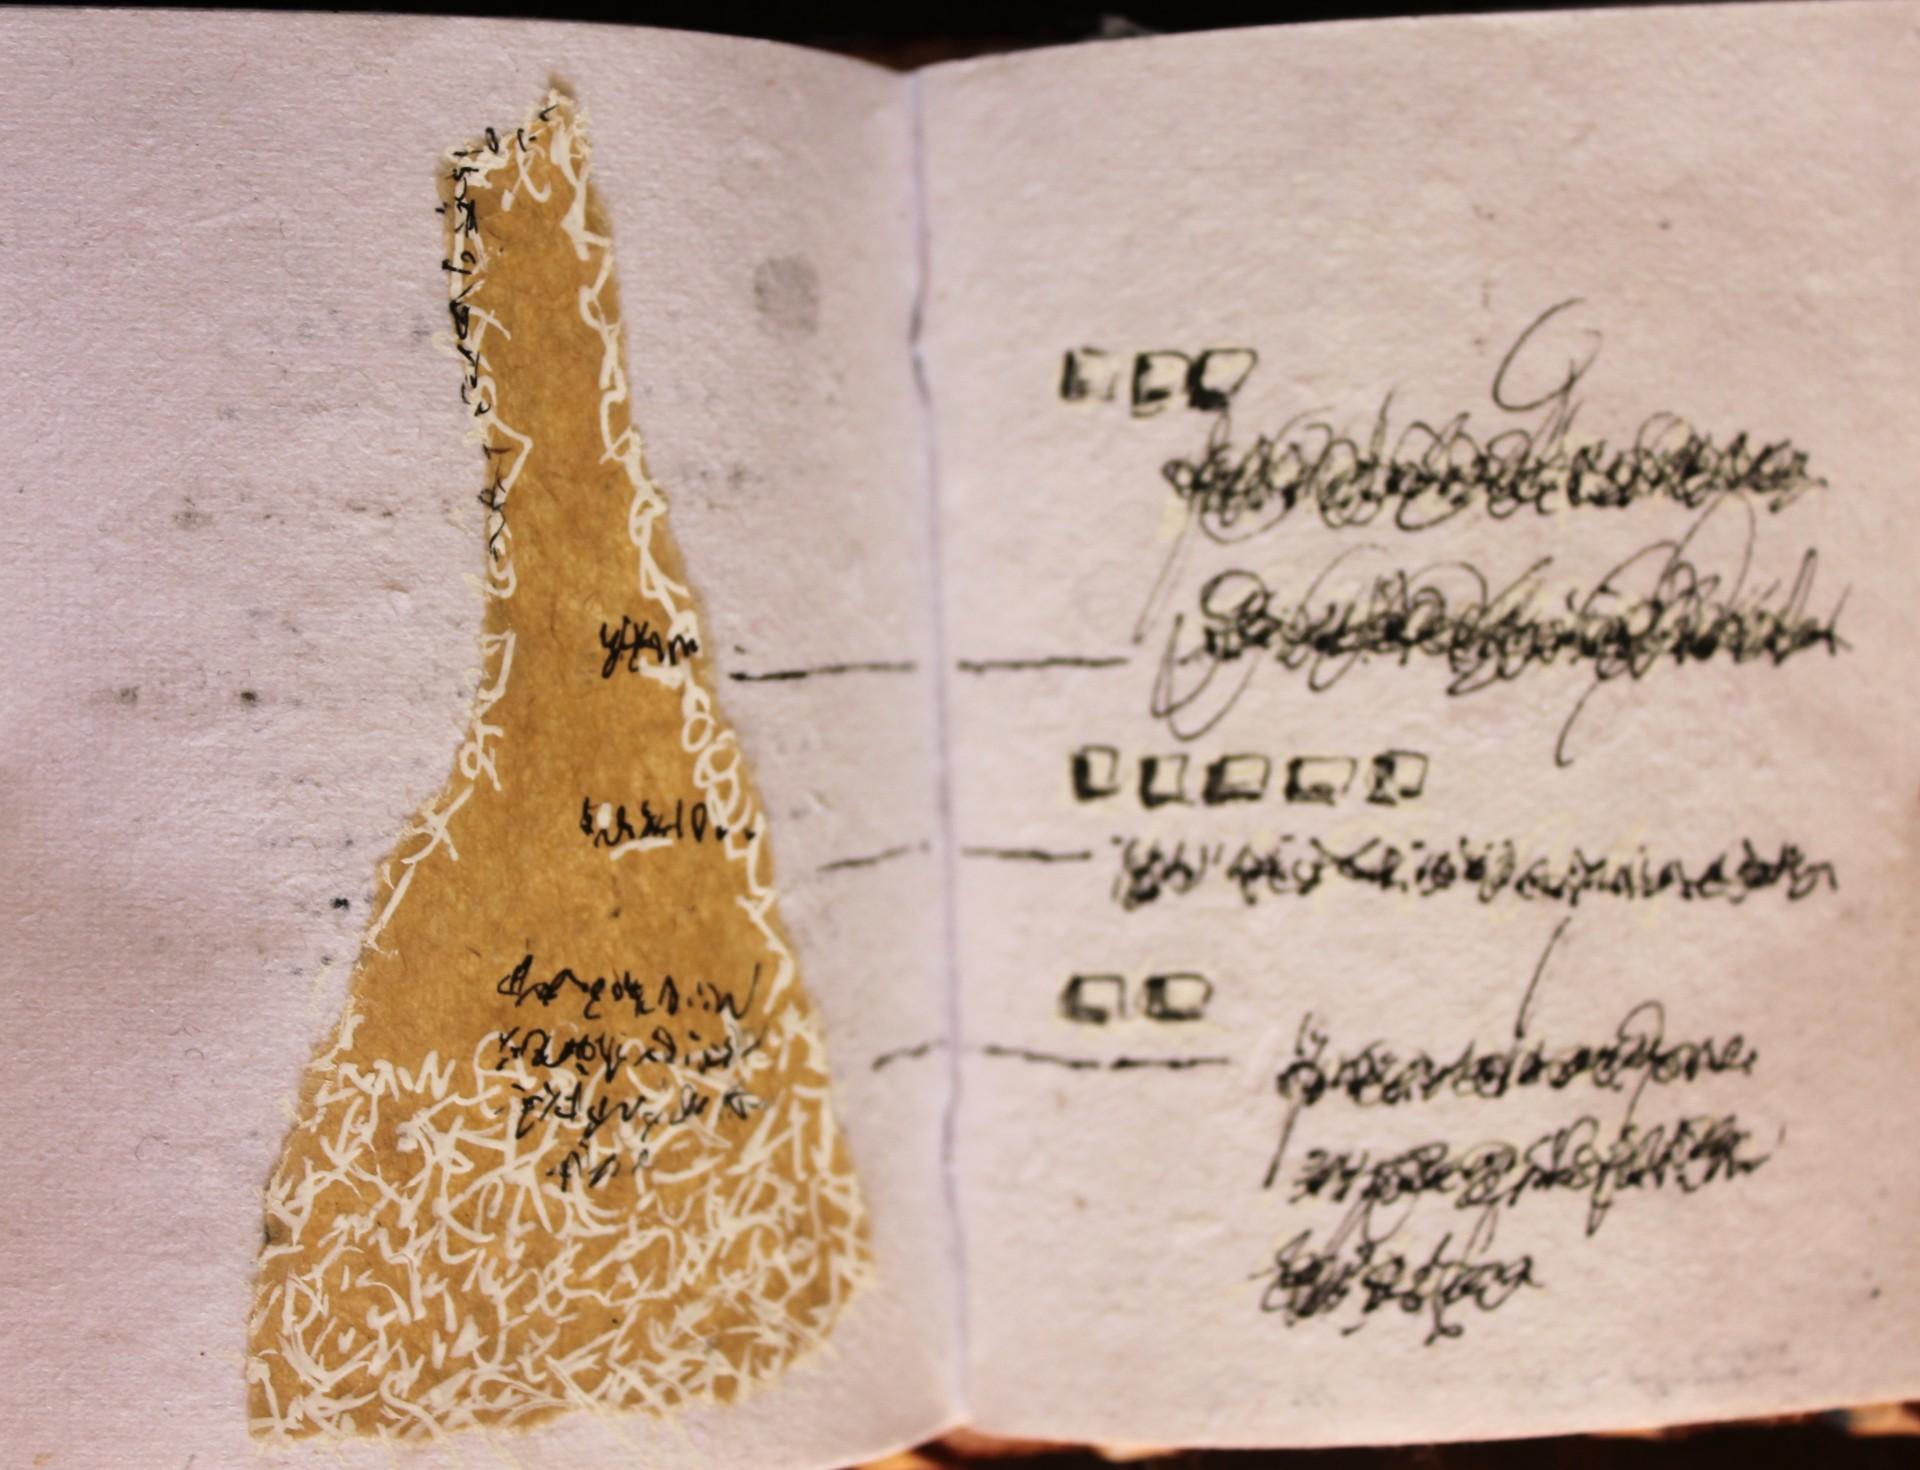 Asemic Sketch